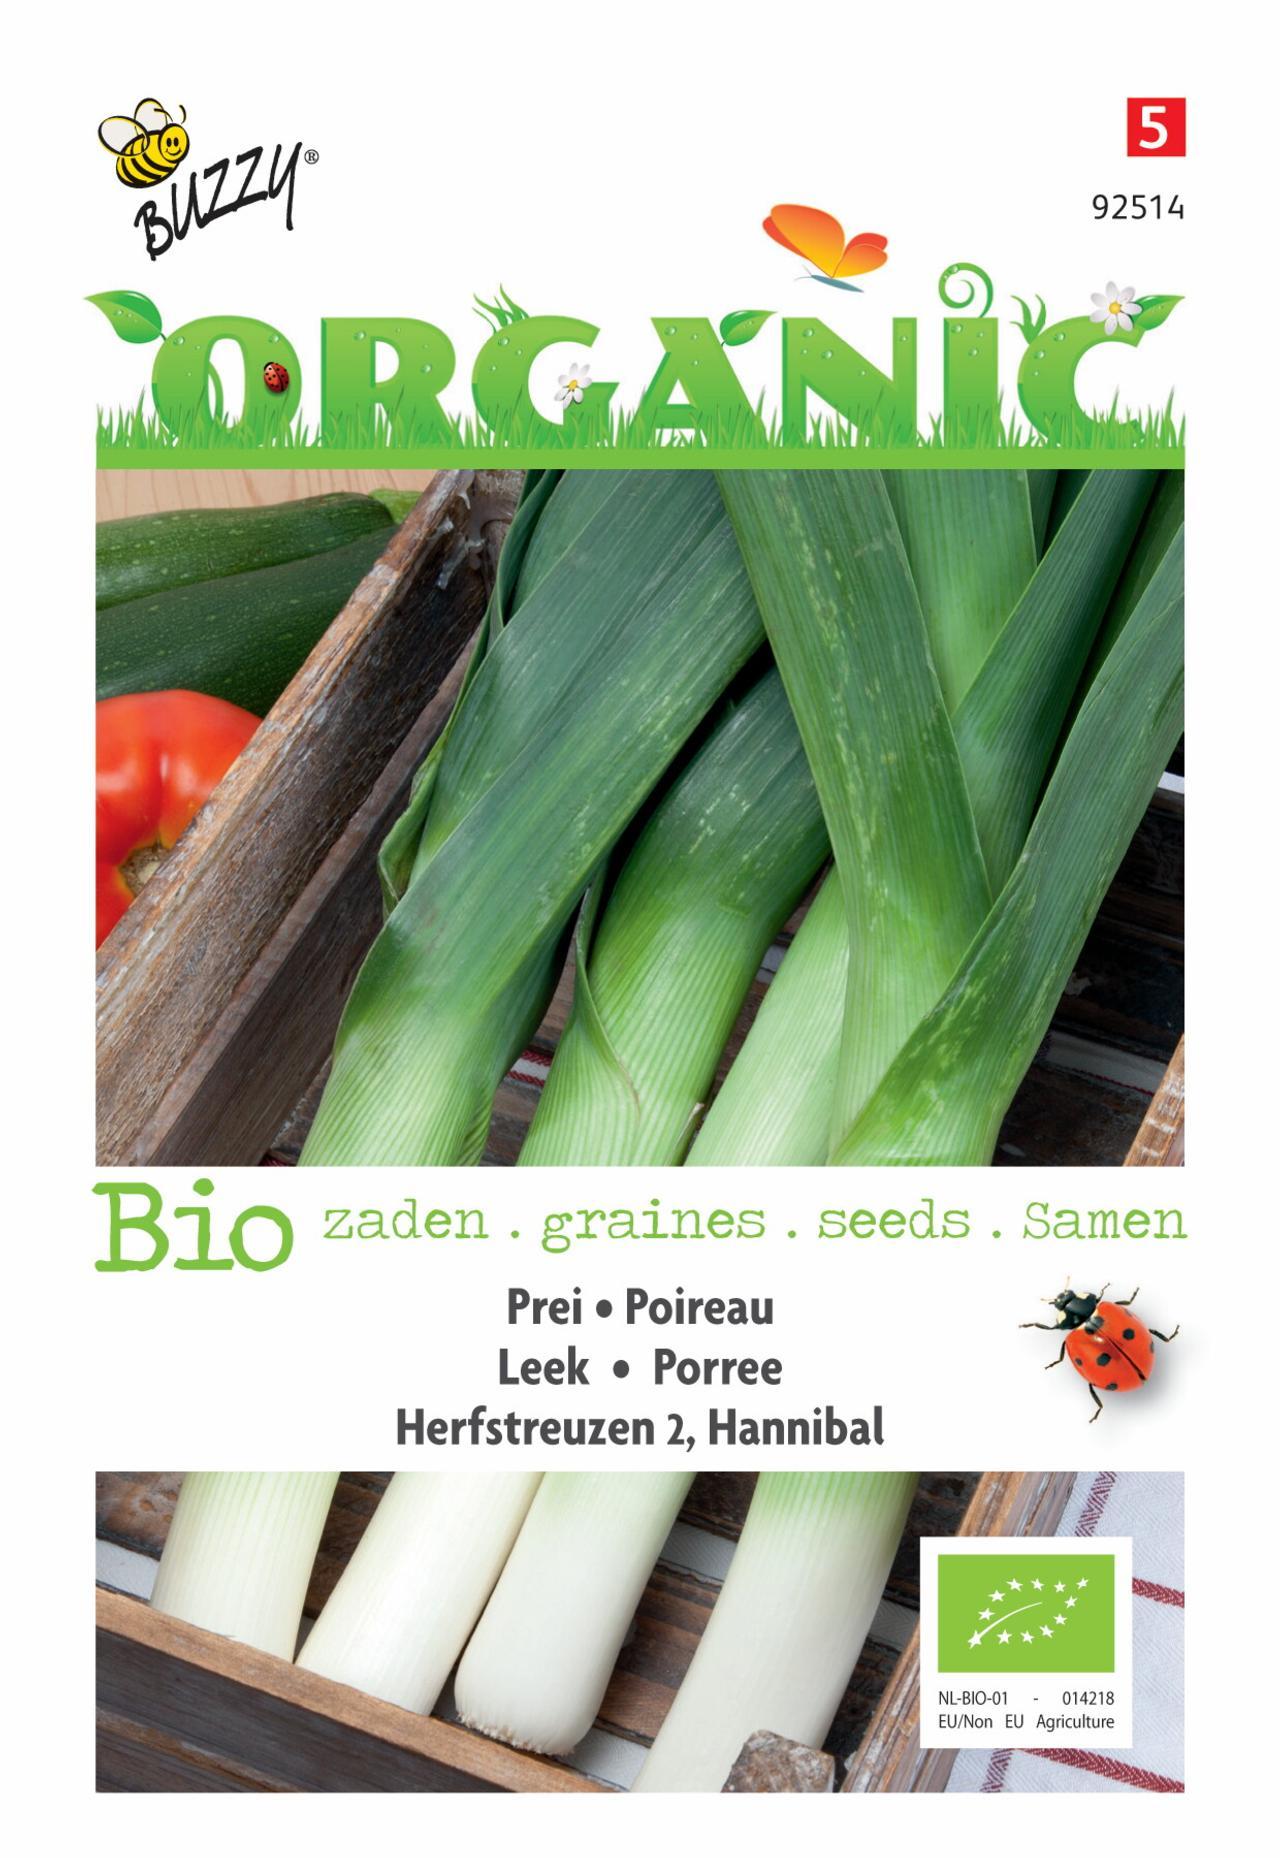 Allium porrum 'Herfstreuzen 2, Hannibal' (BIO) plant